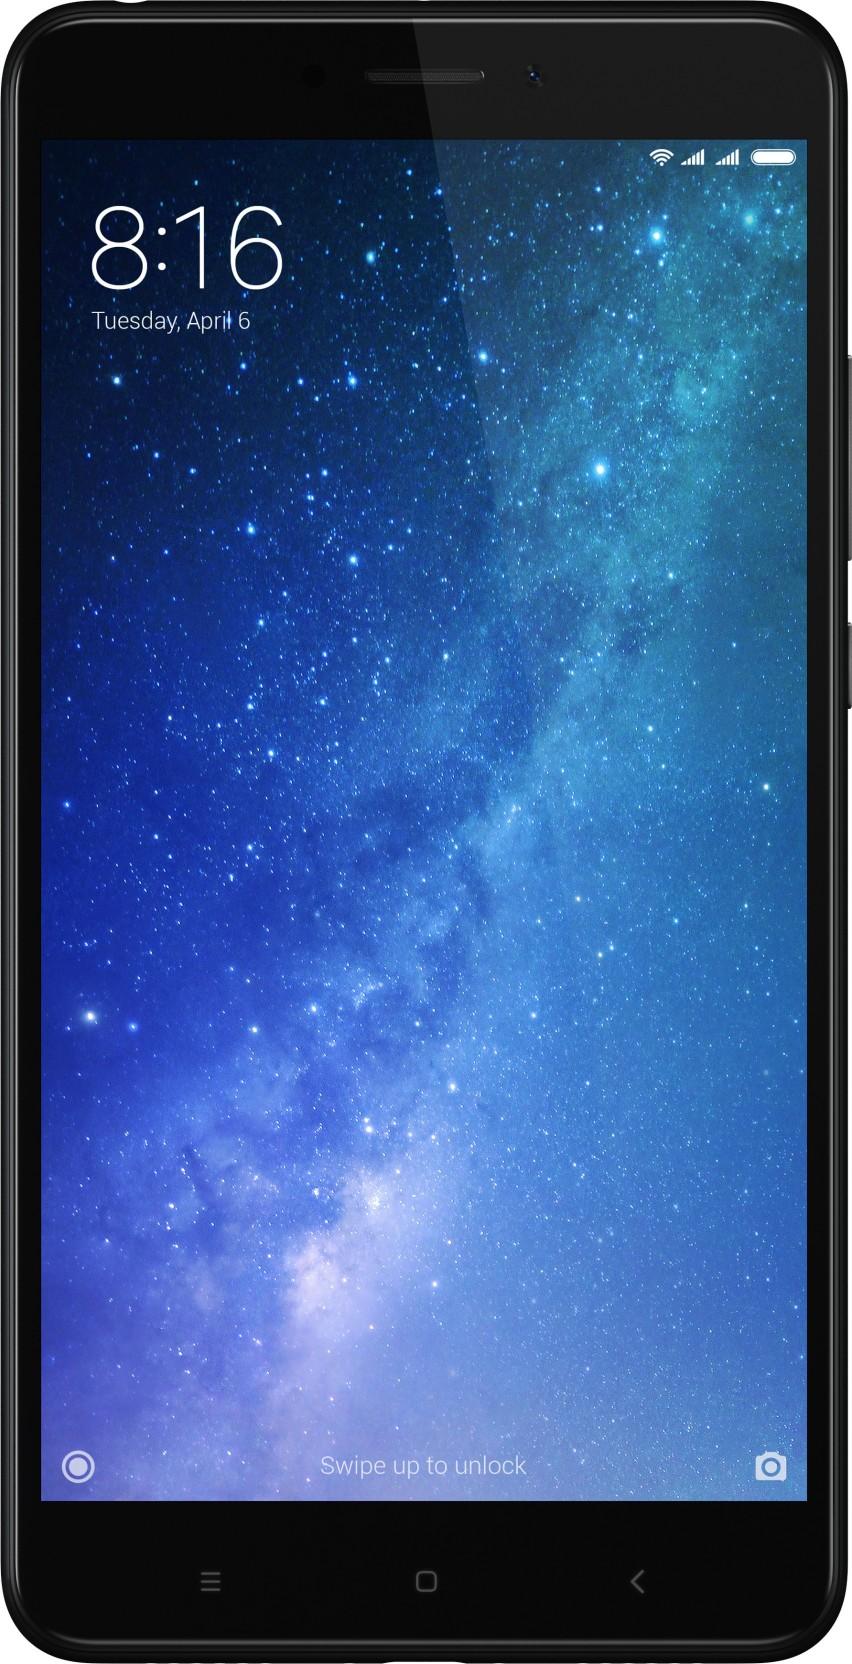 Mi Max 2 Buy Black 64 Gb Mobile Phone Online At Best Xiaomi Redmi Note 4 64gb Ram 4gb Distributor Lte Dual Sim On Offer